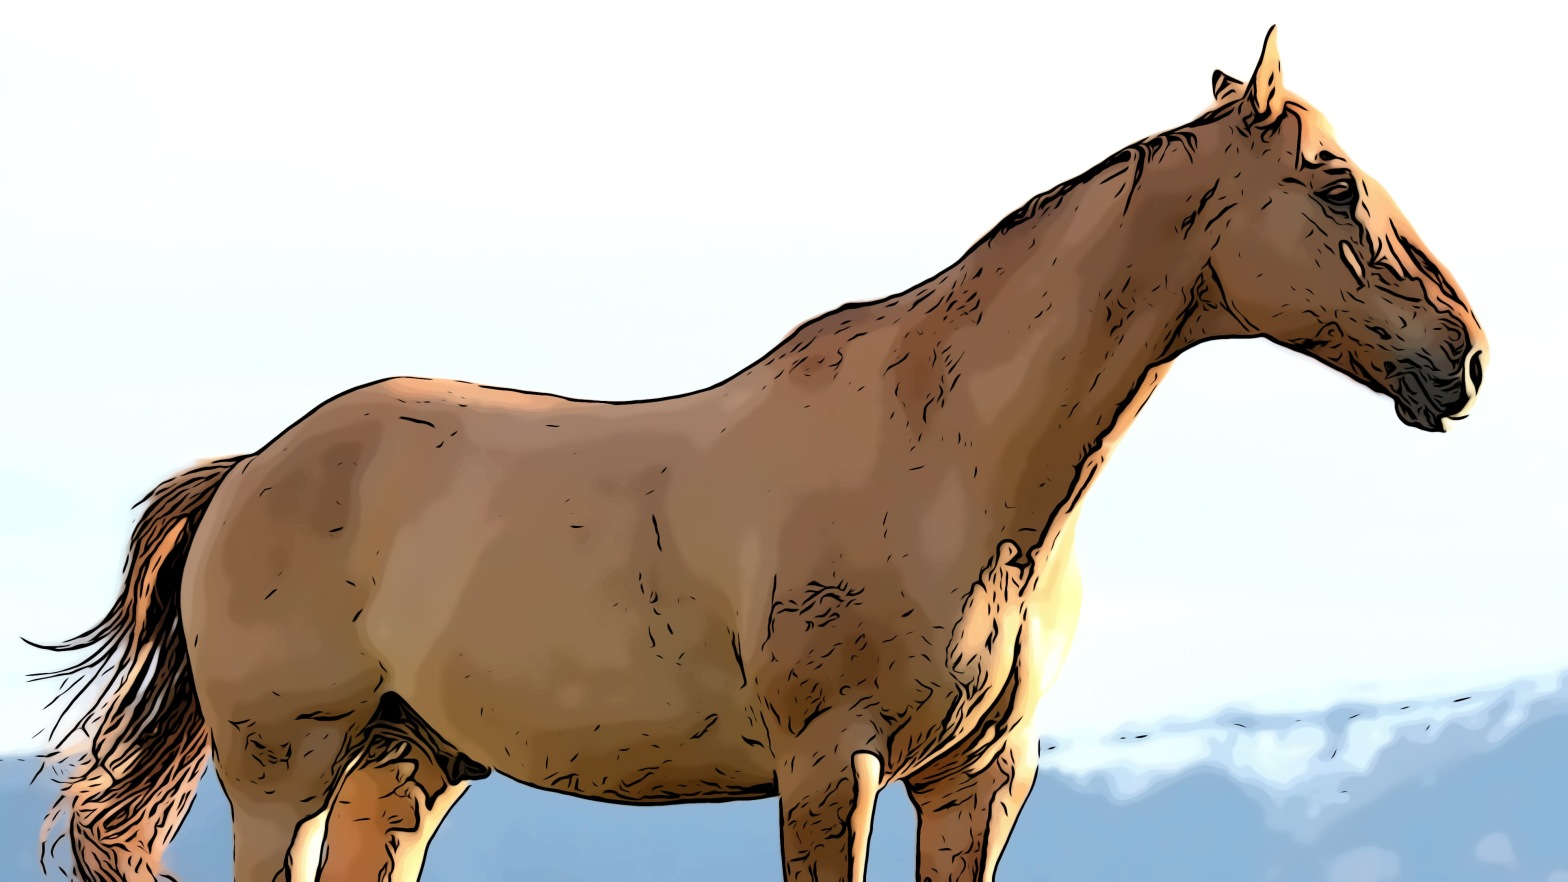 Horse header comic